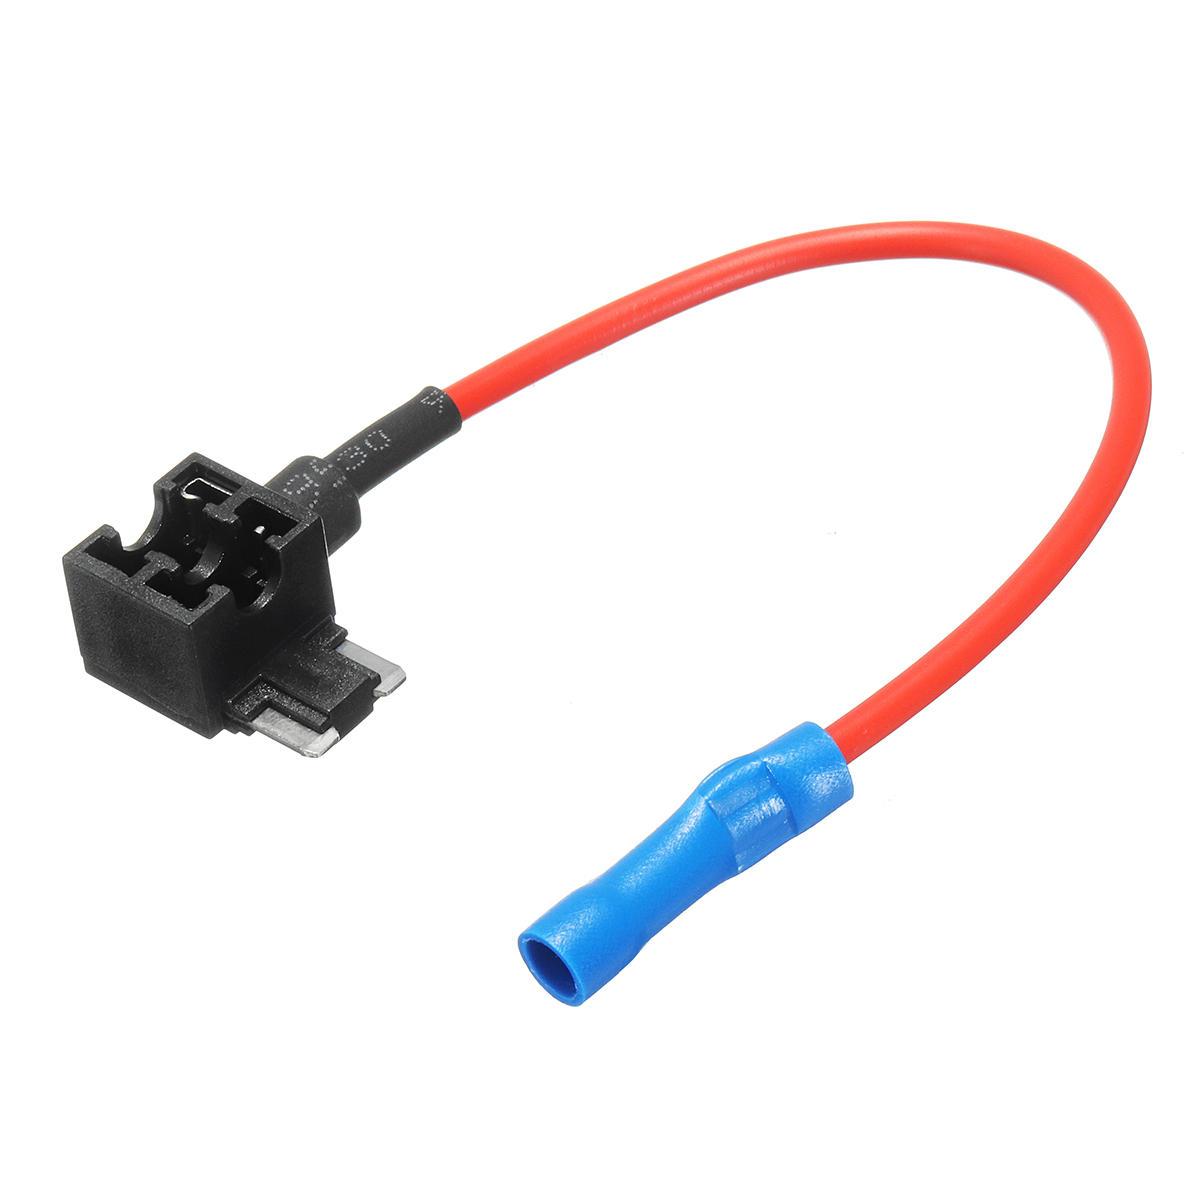 10A Add-A-Circuit Mini Blade Fuse Holder ACS ATO ATC For Car Truck US 5 pcs